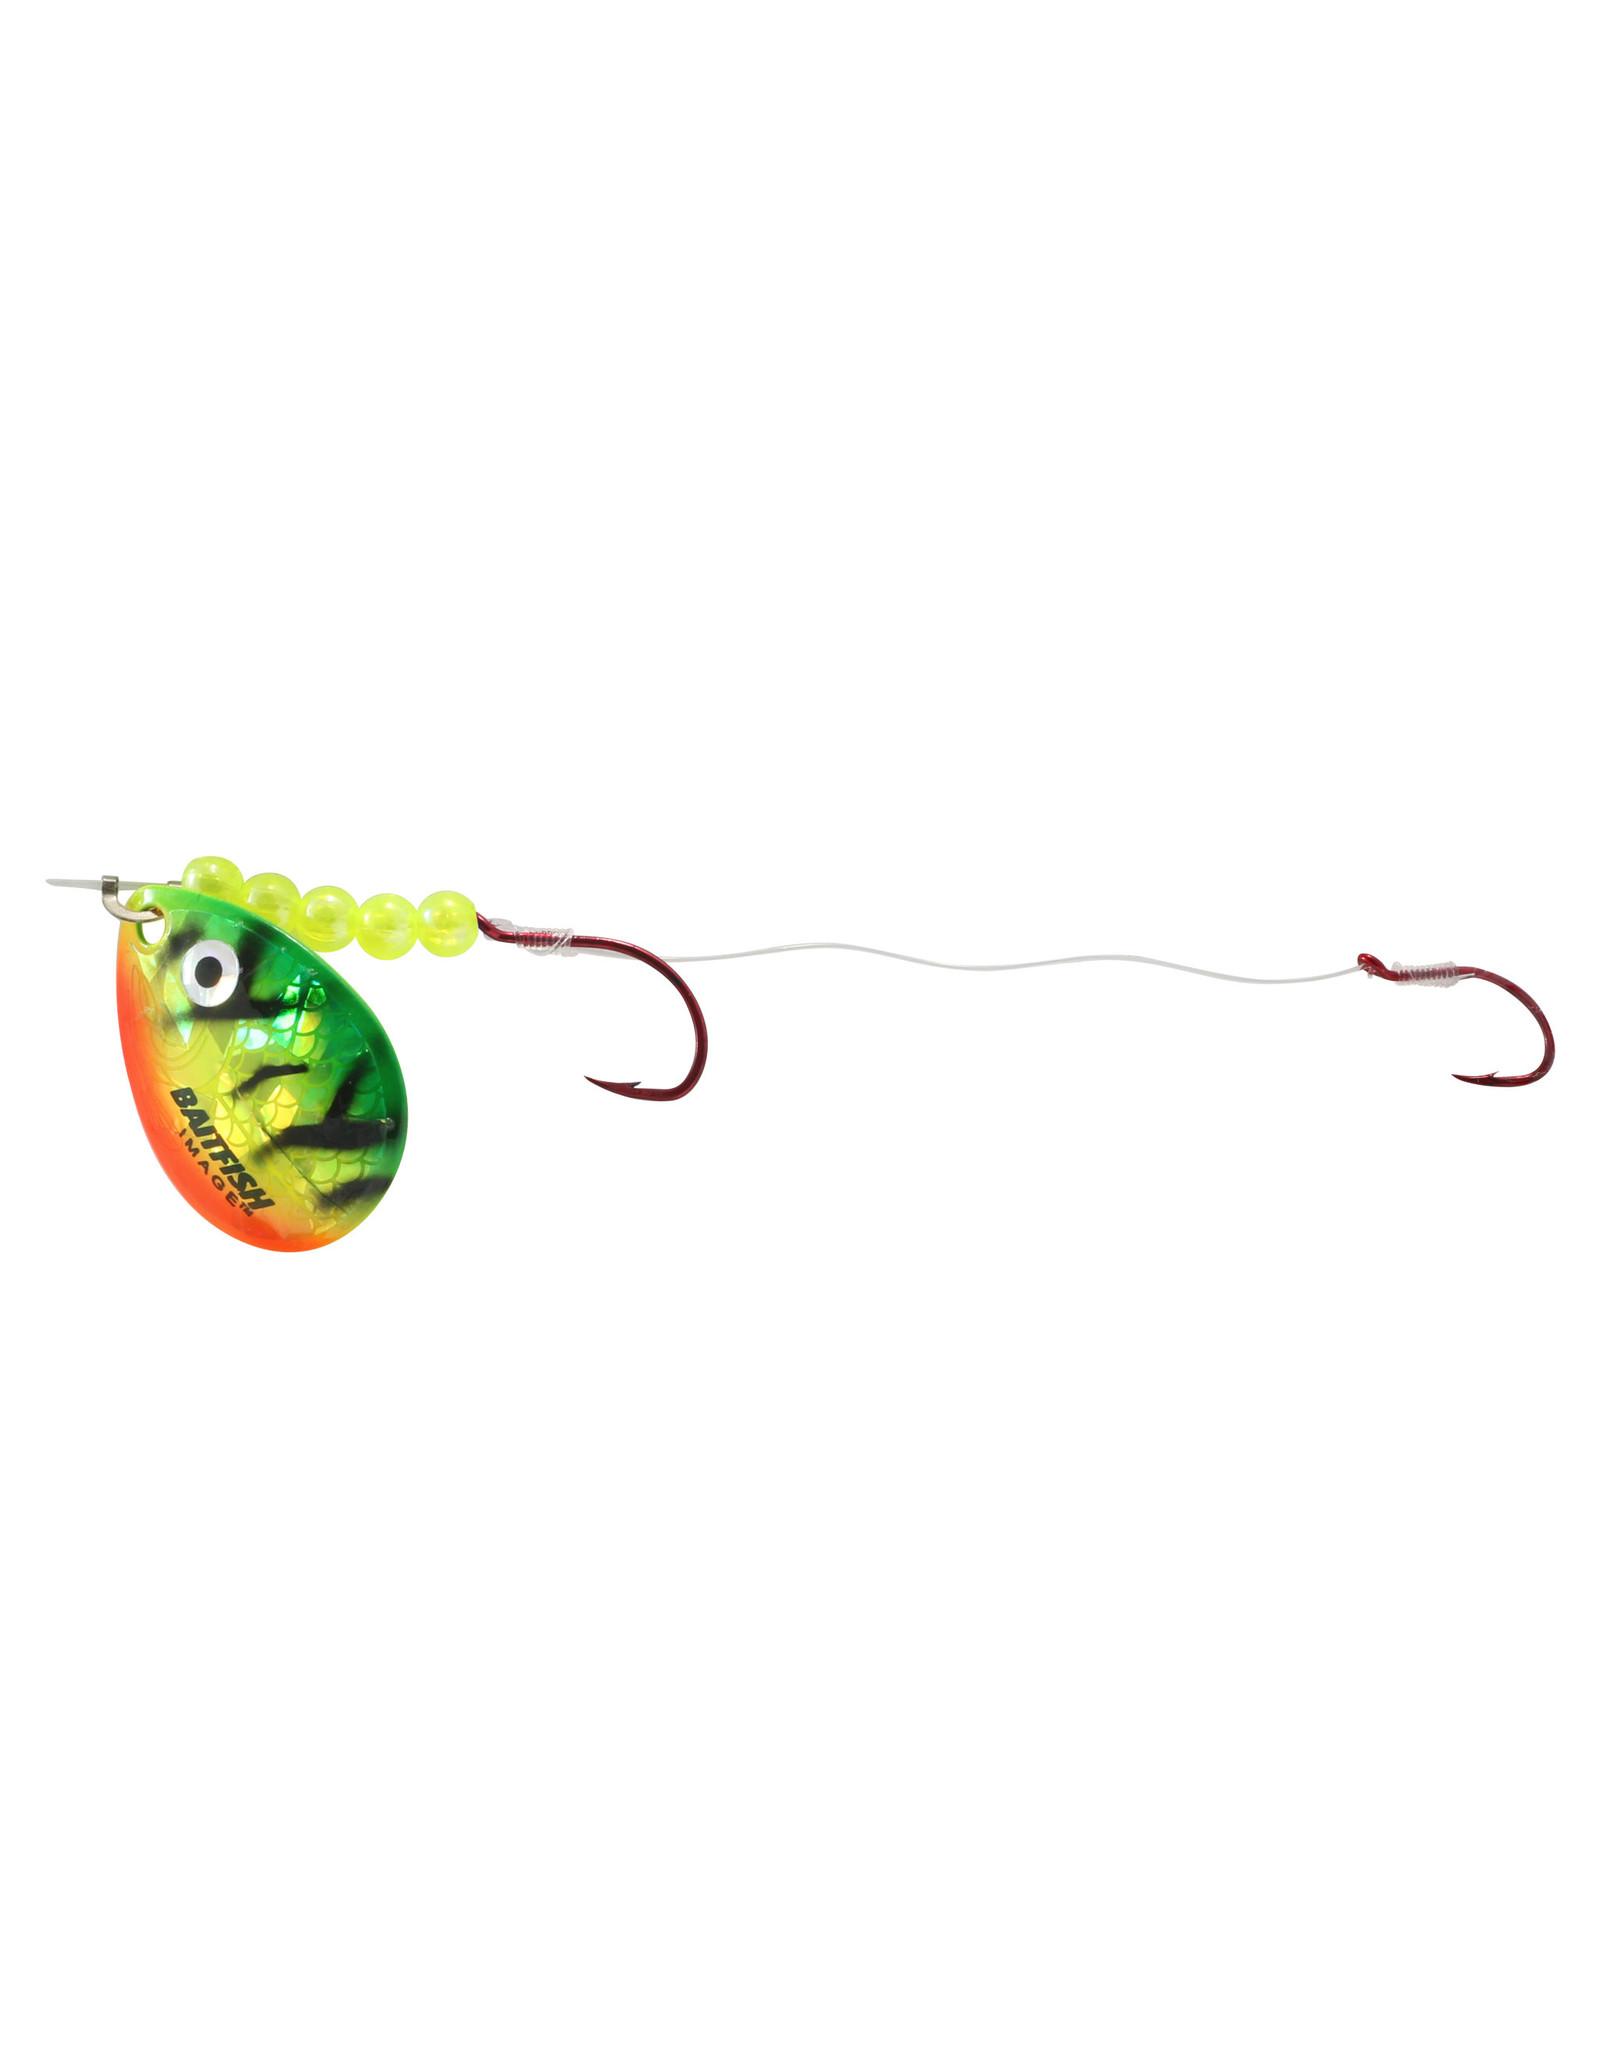 Northland Northland Walleye Spinner Harness